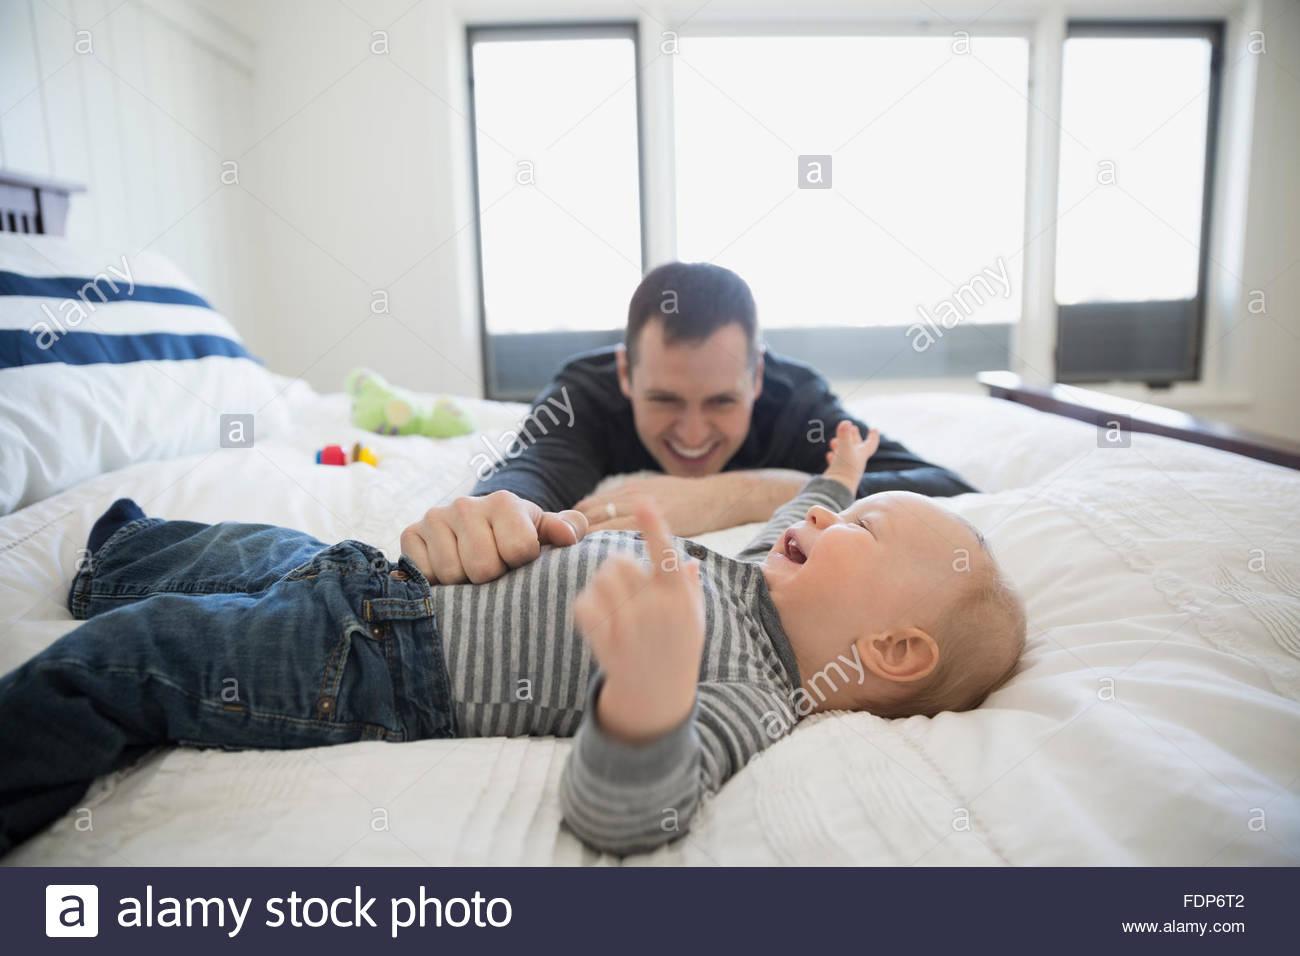 Padre e hijo riendo en la cama Imagen De Stock